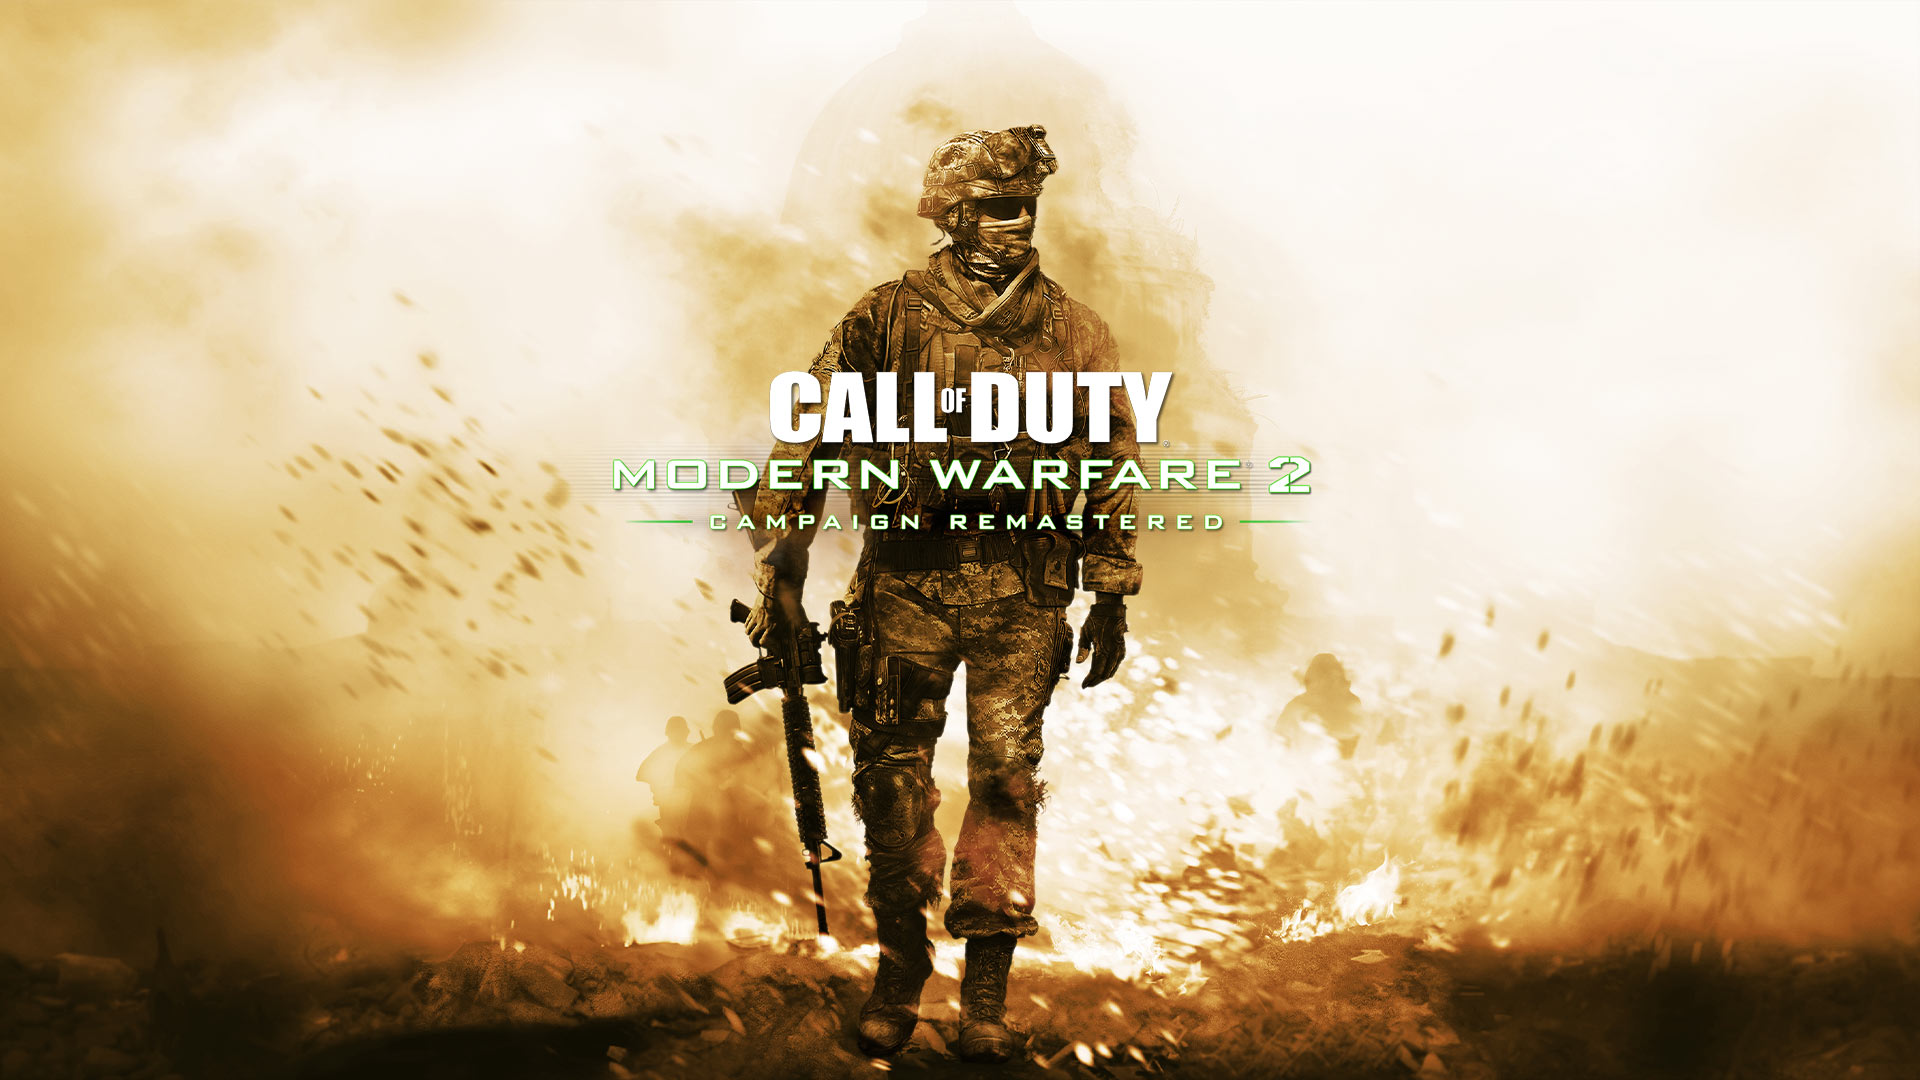 Call Of Duty Modern Warfare 2 PC Full Version Free Download